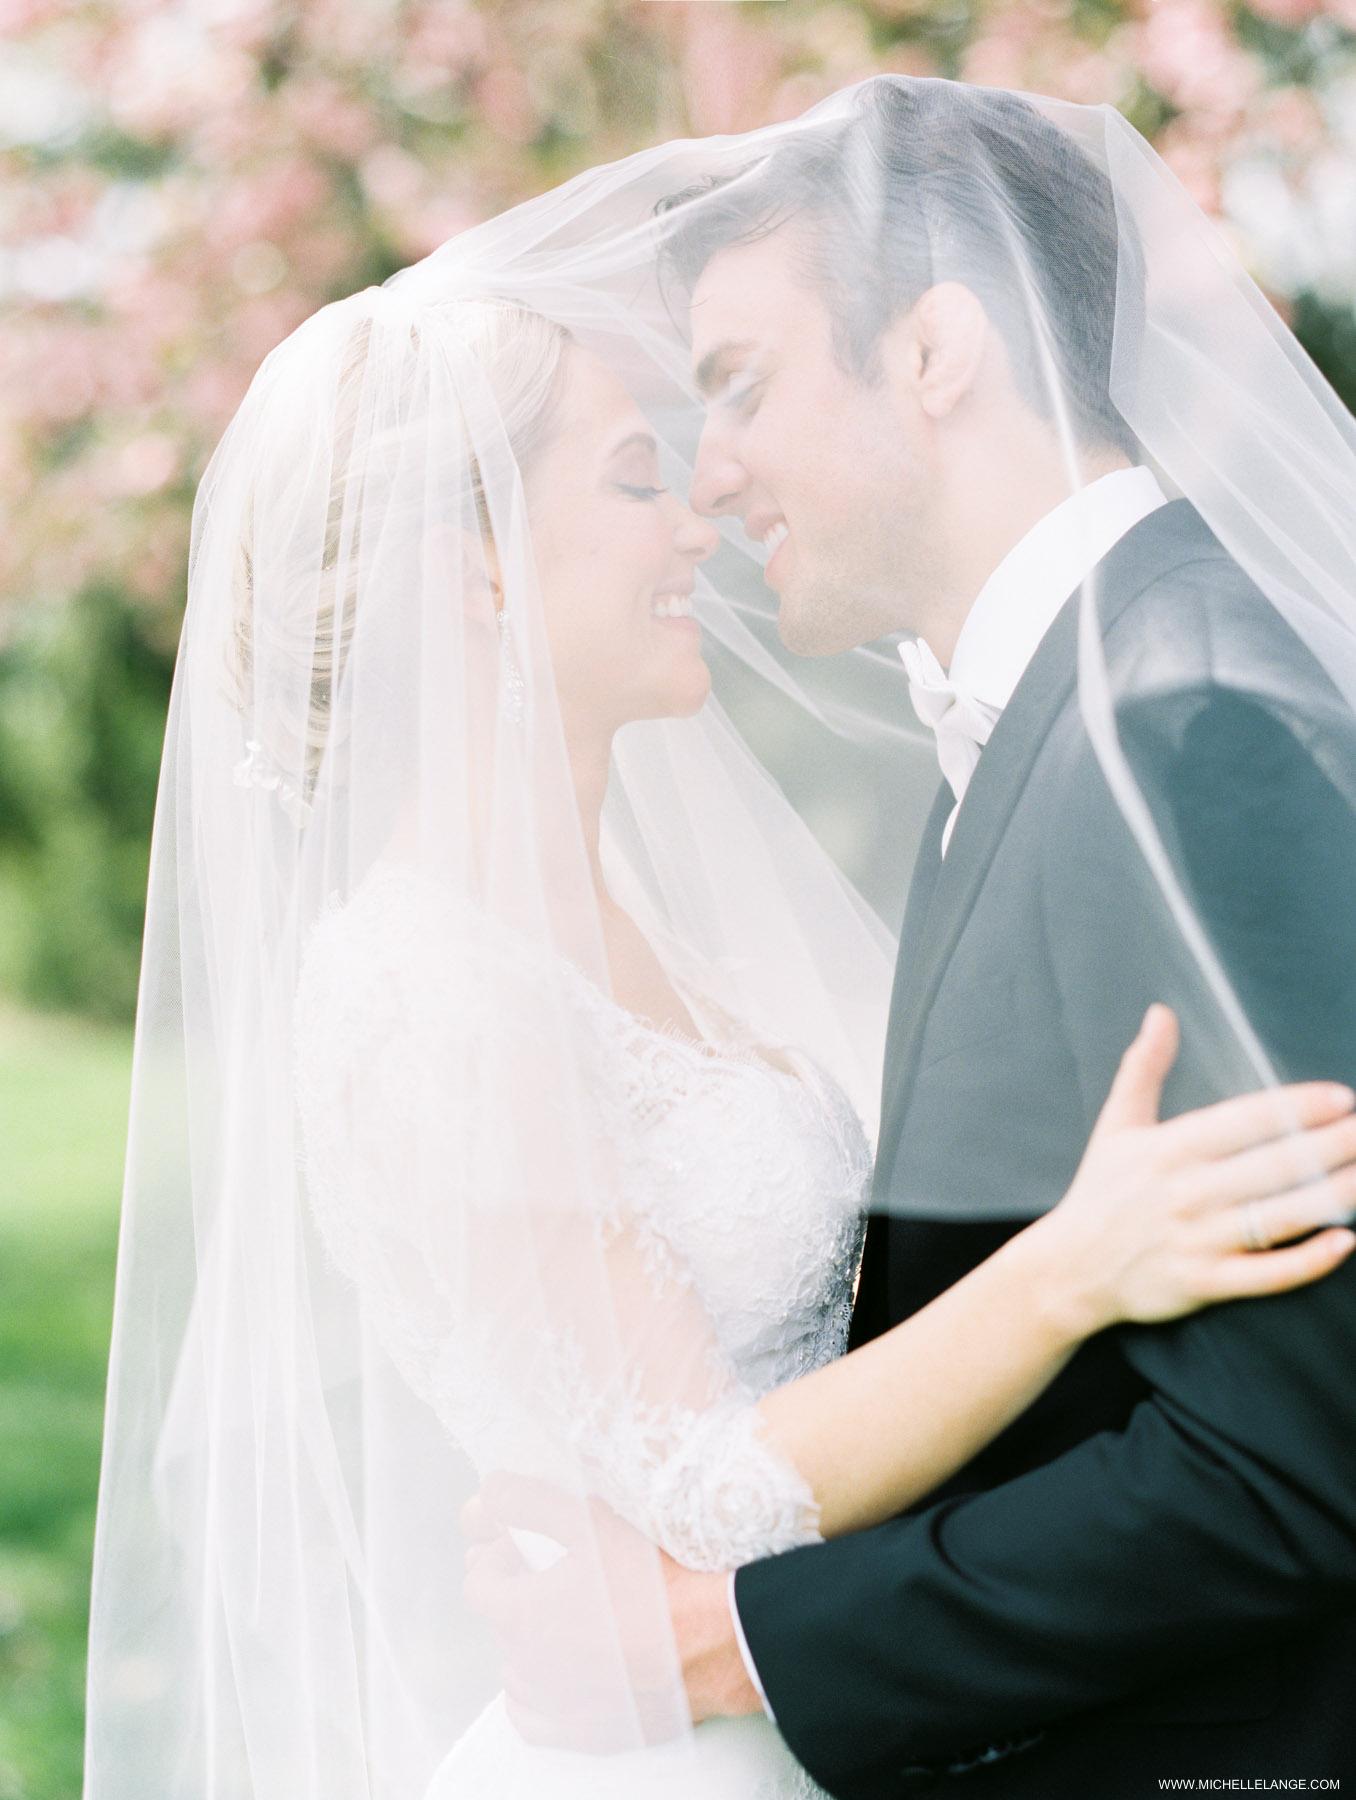 Frelinghuysen Arboretum Morristown NJ Wedding Photography